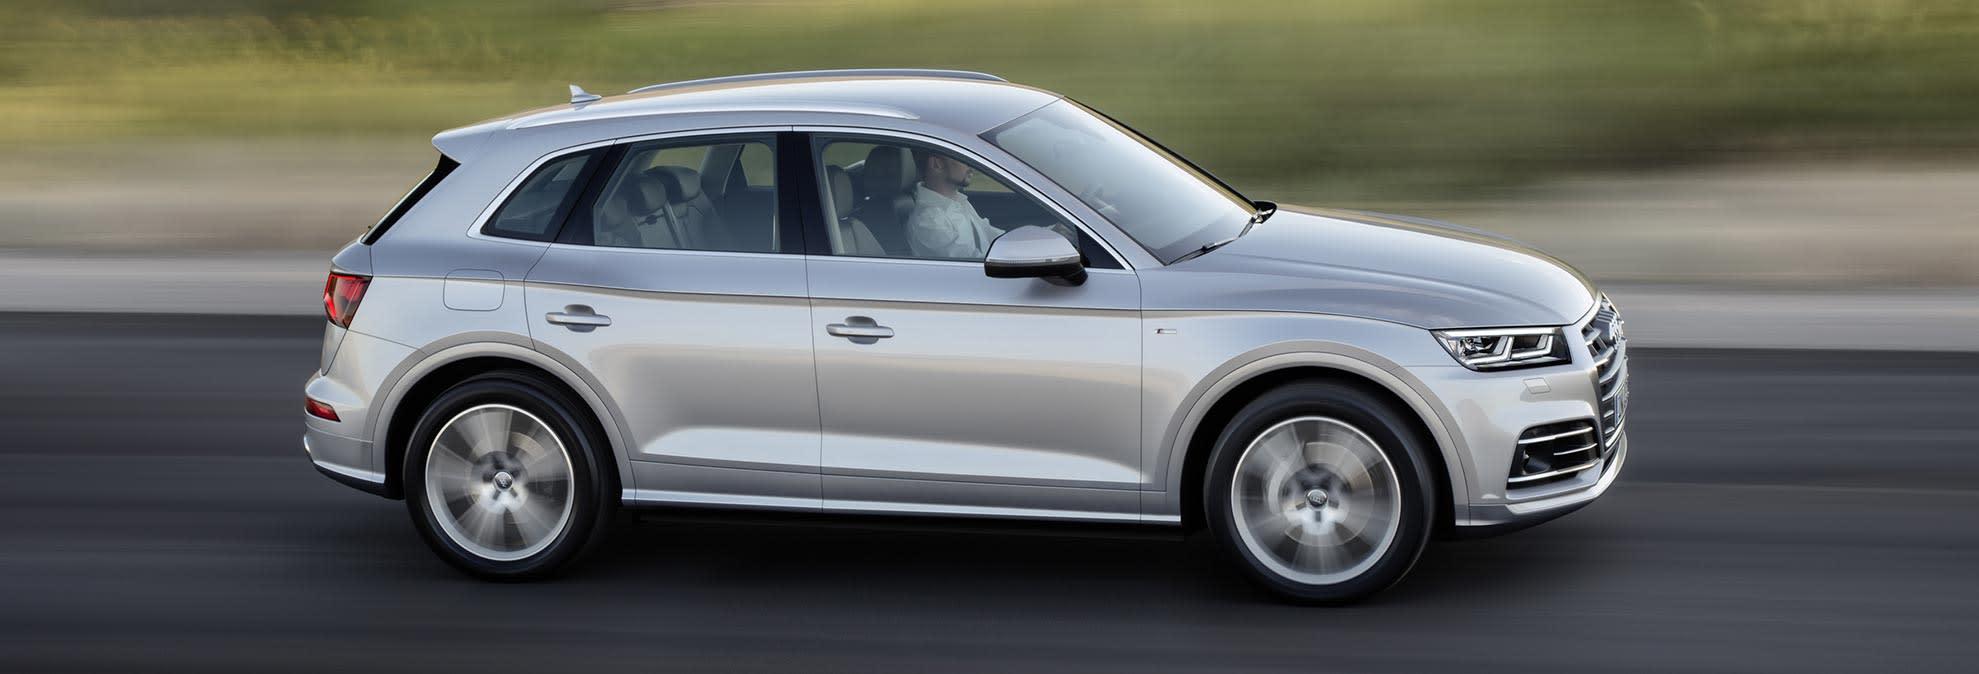 Preview 2018 Audi Q5 Suv